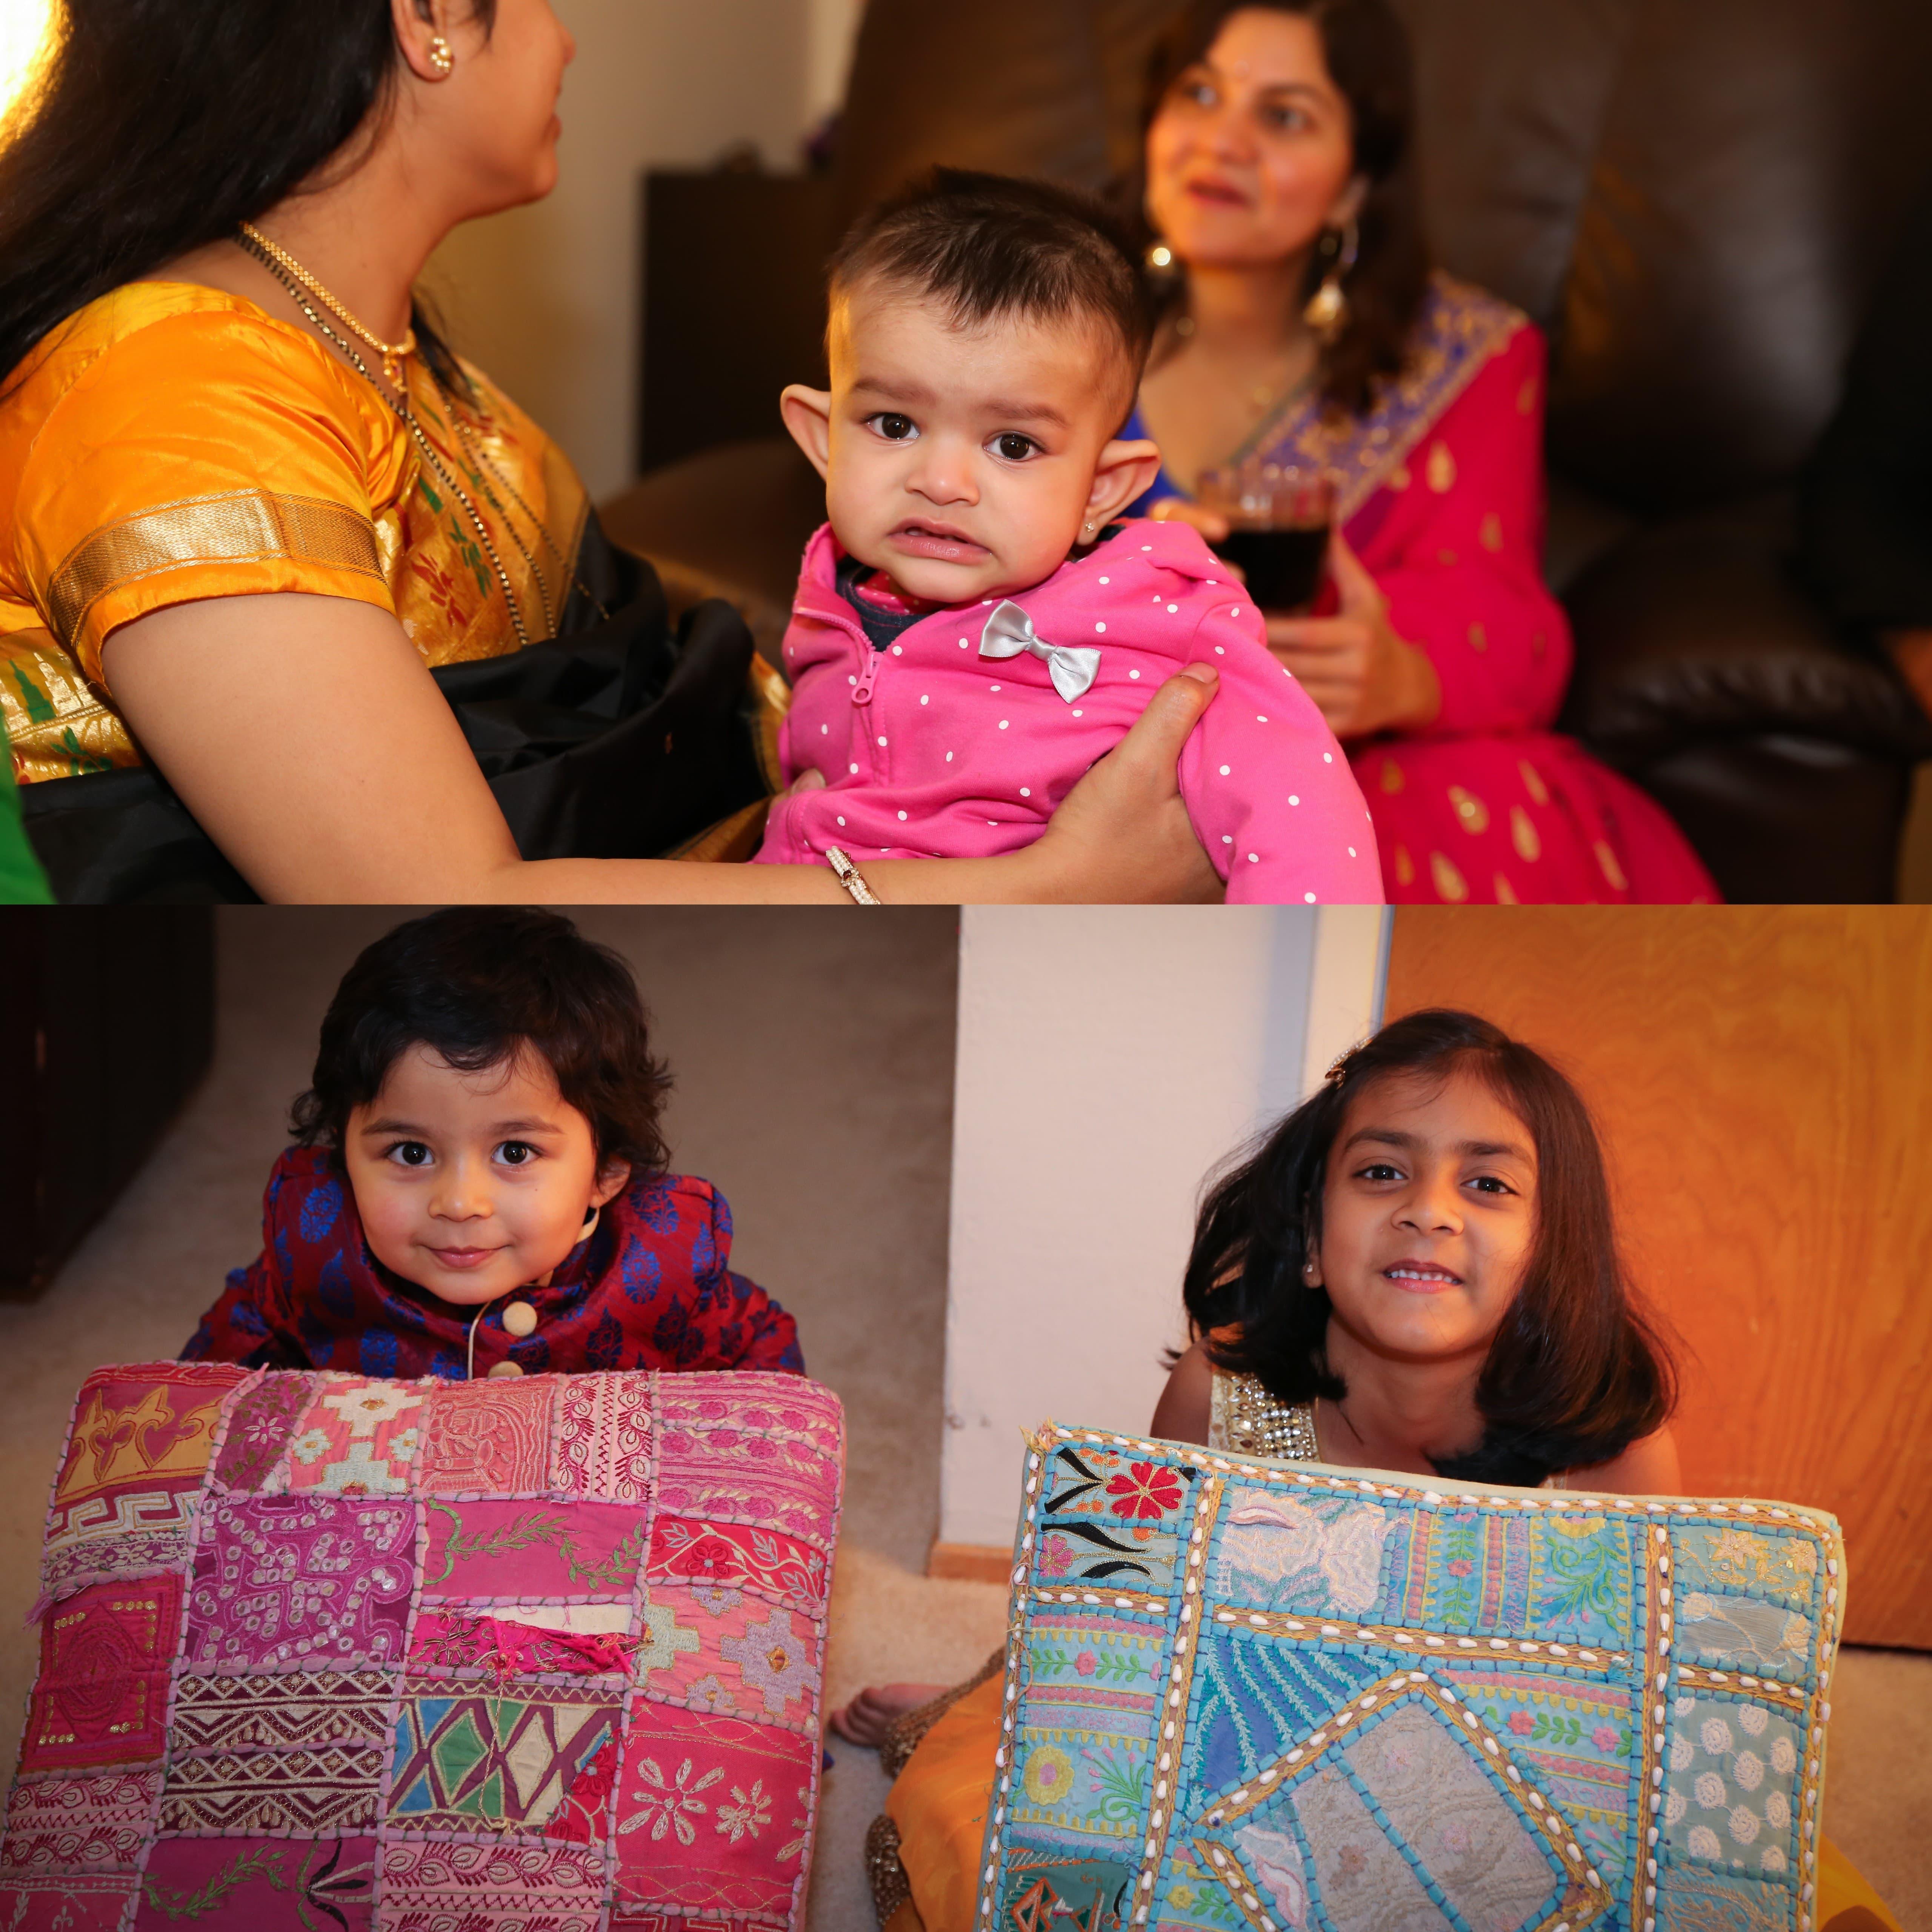 Diwali Celebrations, 5days of Diwali, Diwali in USA, Dhanatrayodashi, Narakchaturdashi, Diwali, Padva, Bhajbheej, Diwali Snacks, Rangoli, Firecrackers, Festival of lights, Indian festivals, Celebrations